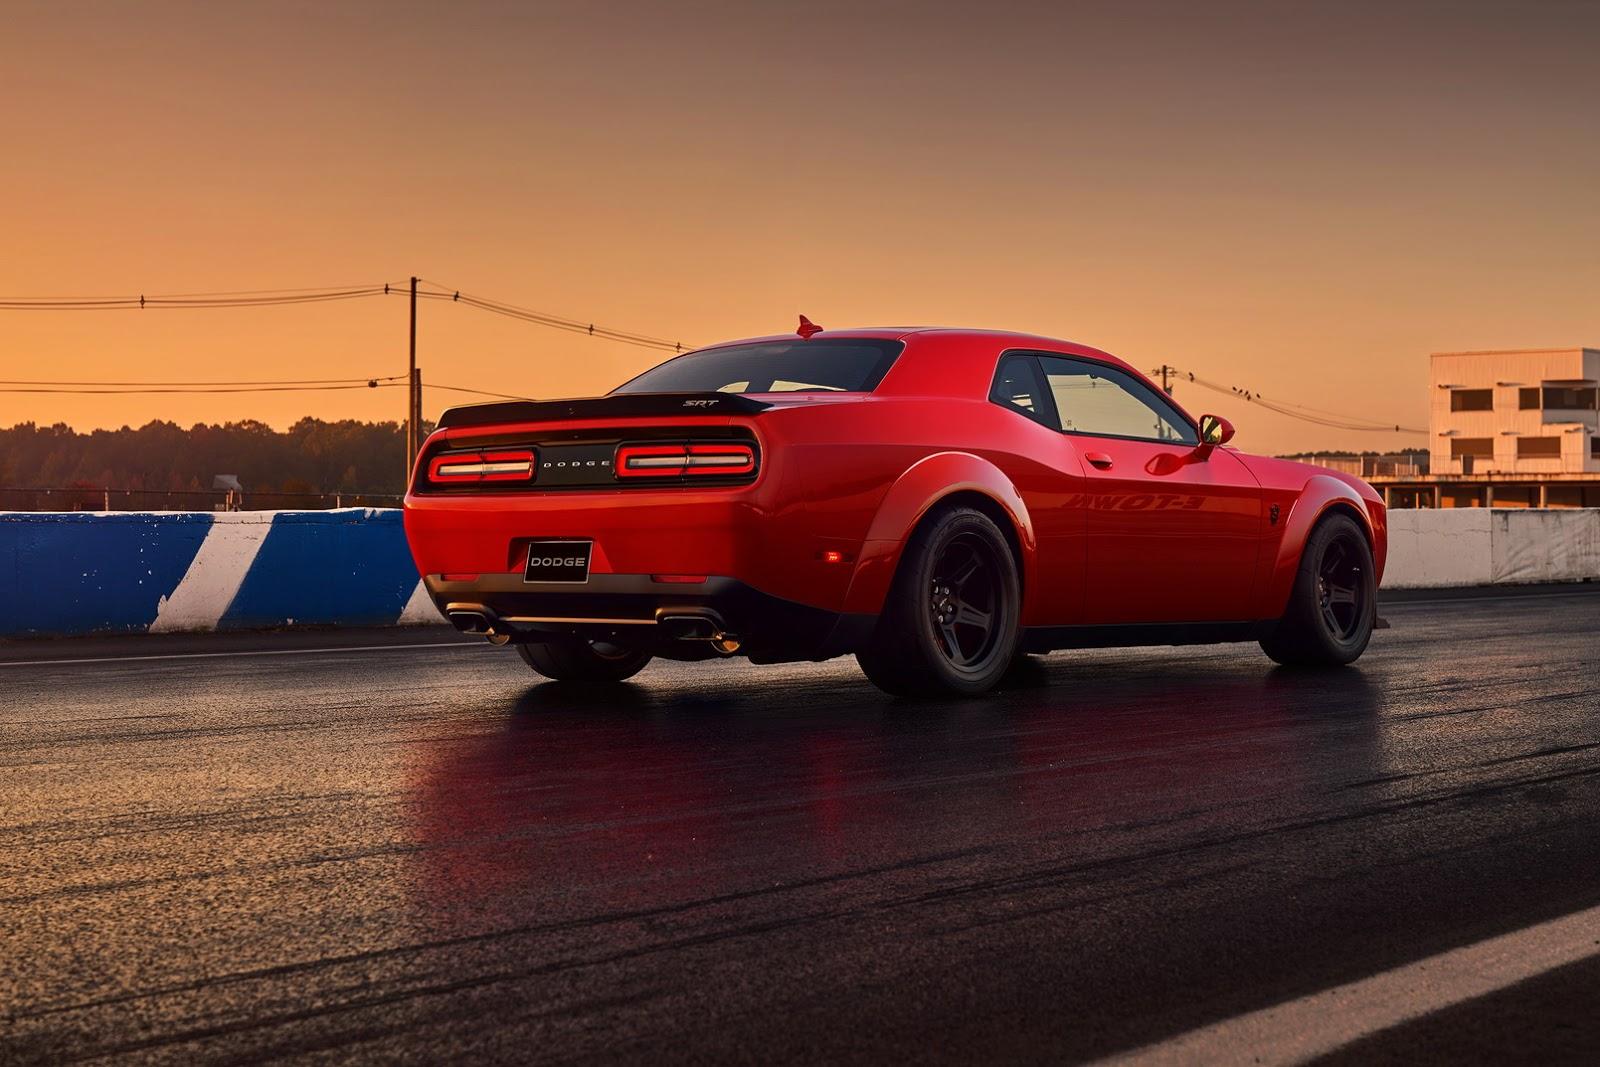 2018 dodge challenger srt demon is the world s fastest 0 60mph production car. Black Bedroom Furniture Sets. Home Design Ideas